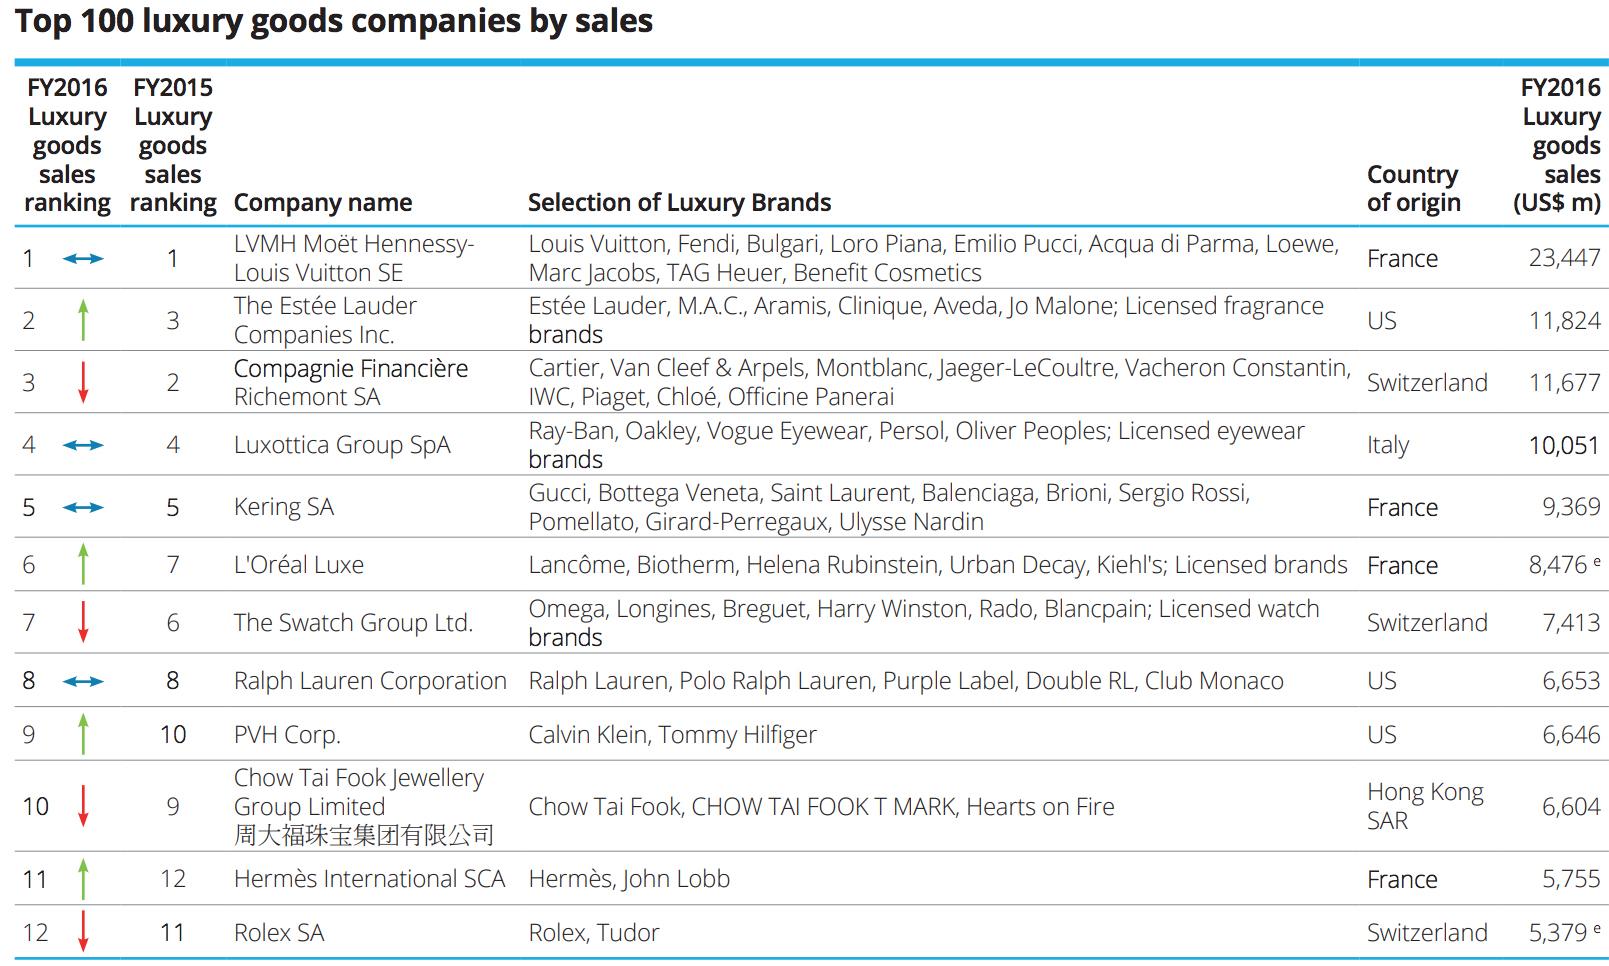 Deloitte 公布 2018 全球奢侈品公司 TOP 100 排行榜